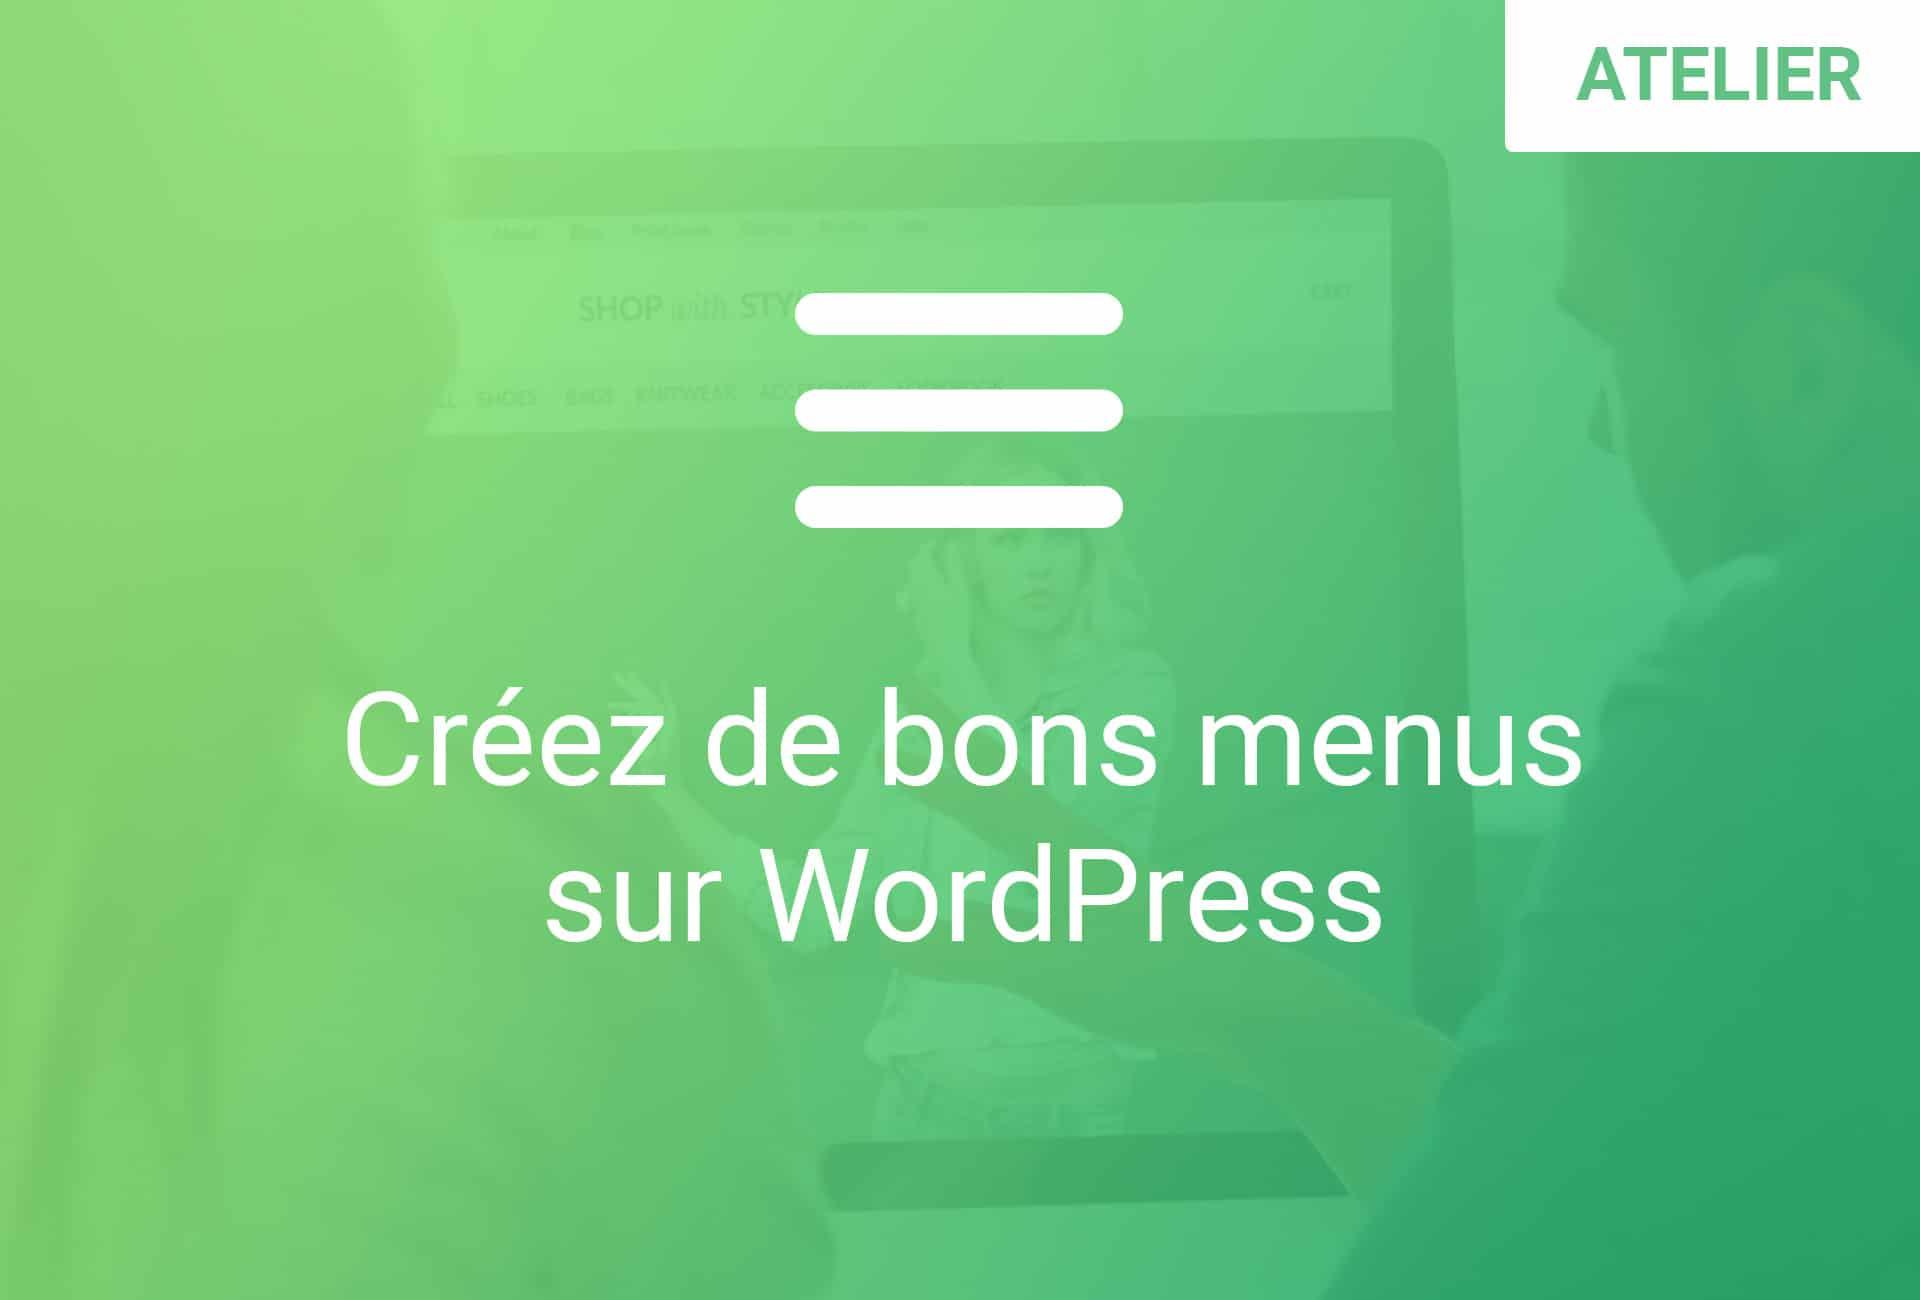 b3f9bad7ea8 Atelier - Créer de bons menus dans WordPress